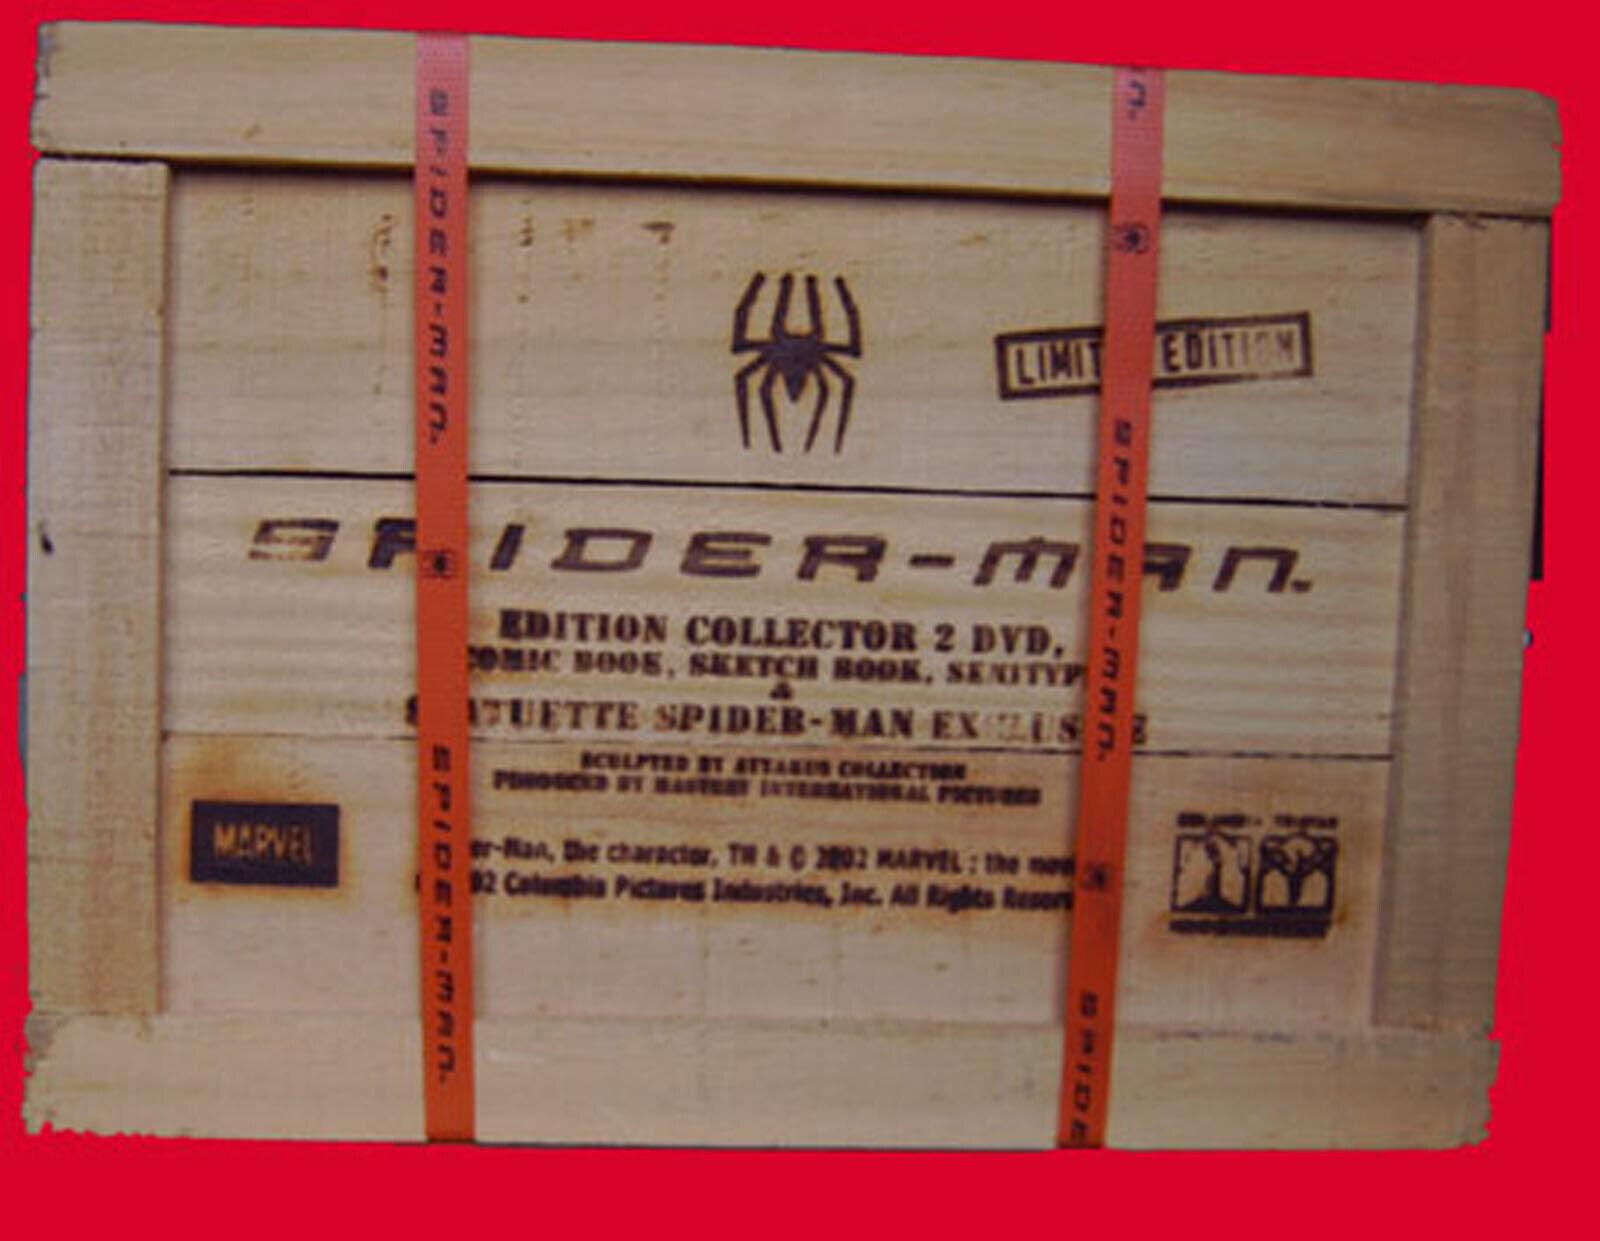 COFFRET BOIS SPIDER-MAN  Ultimate  EDITION LIMITEE LIMITEE LIMITEE NEUF SCELLE 7bfc18